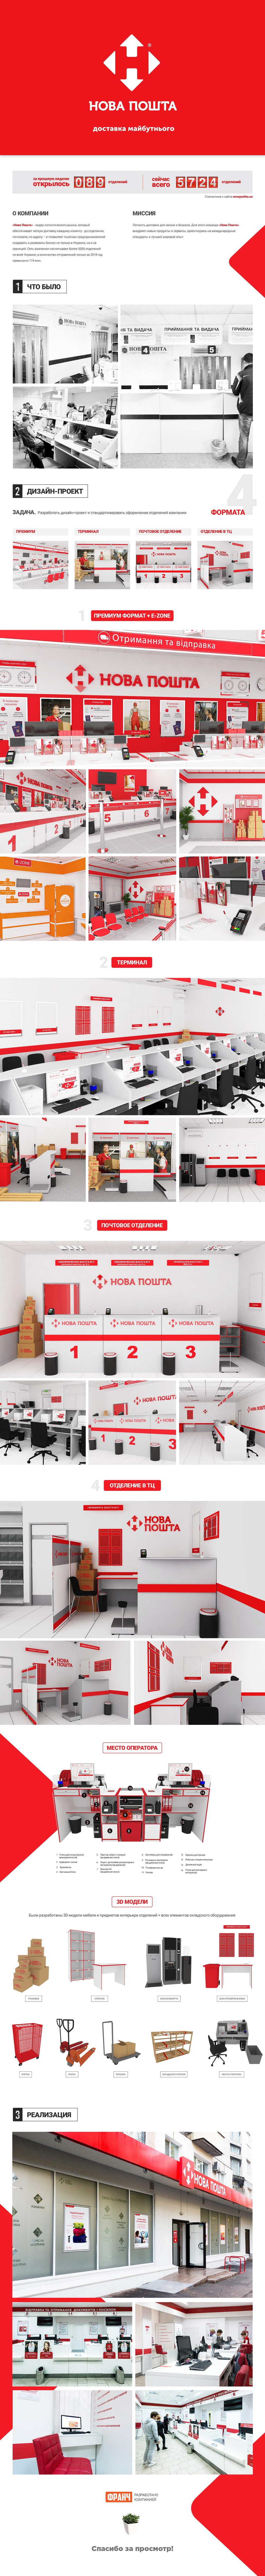 #Postoffice #новаяпочта #franchise #DesignProject #interior #дизайнпроектинтерьера #франшиза #exterior #3dmodeling #business